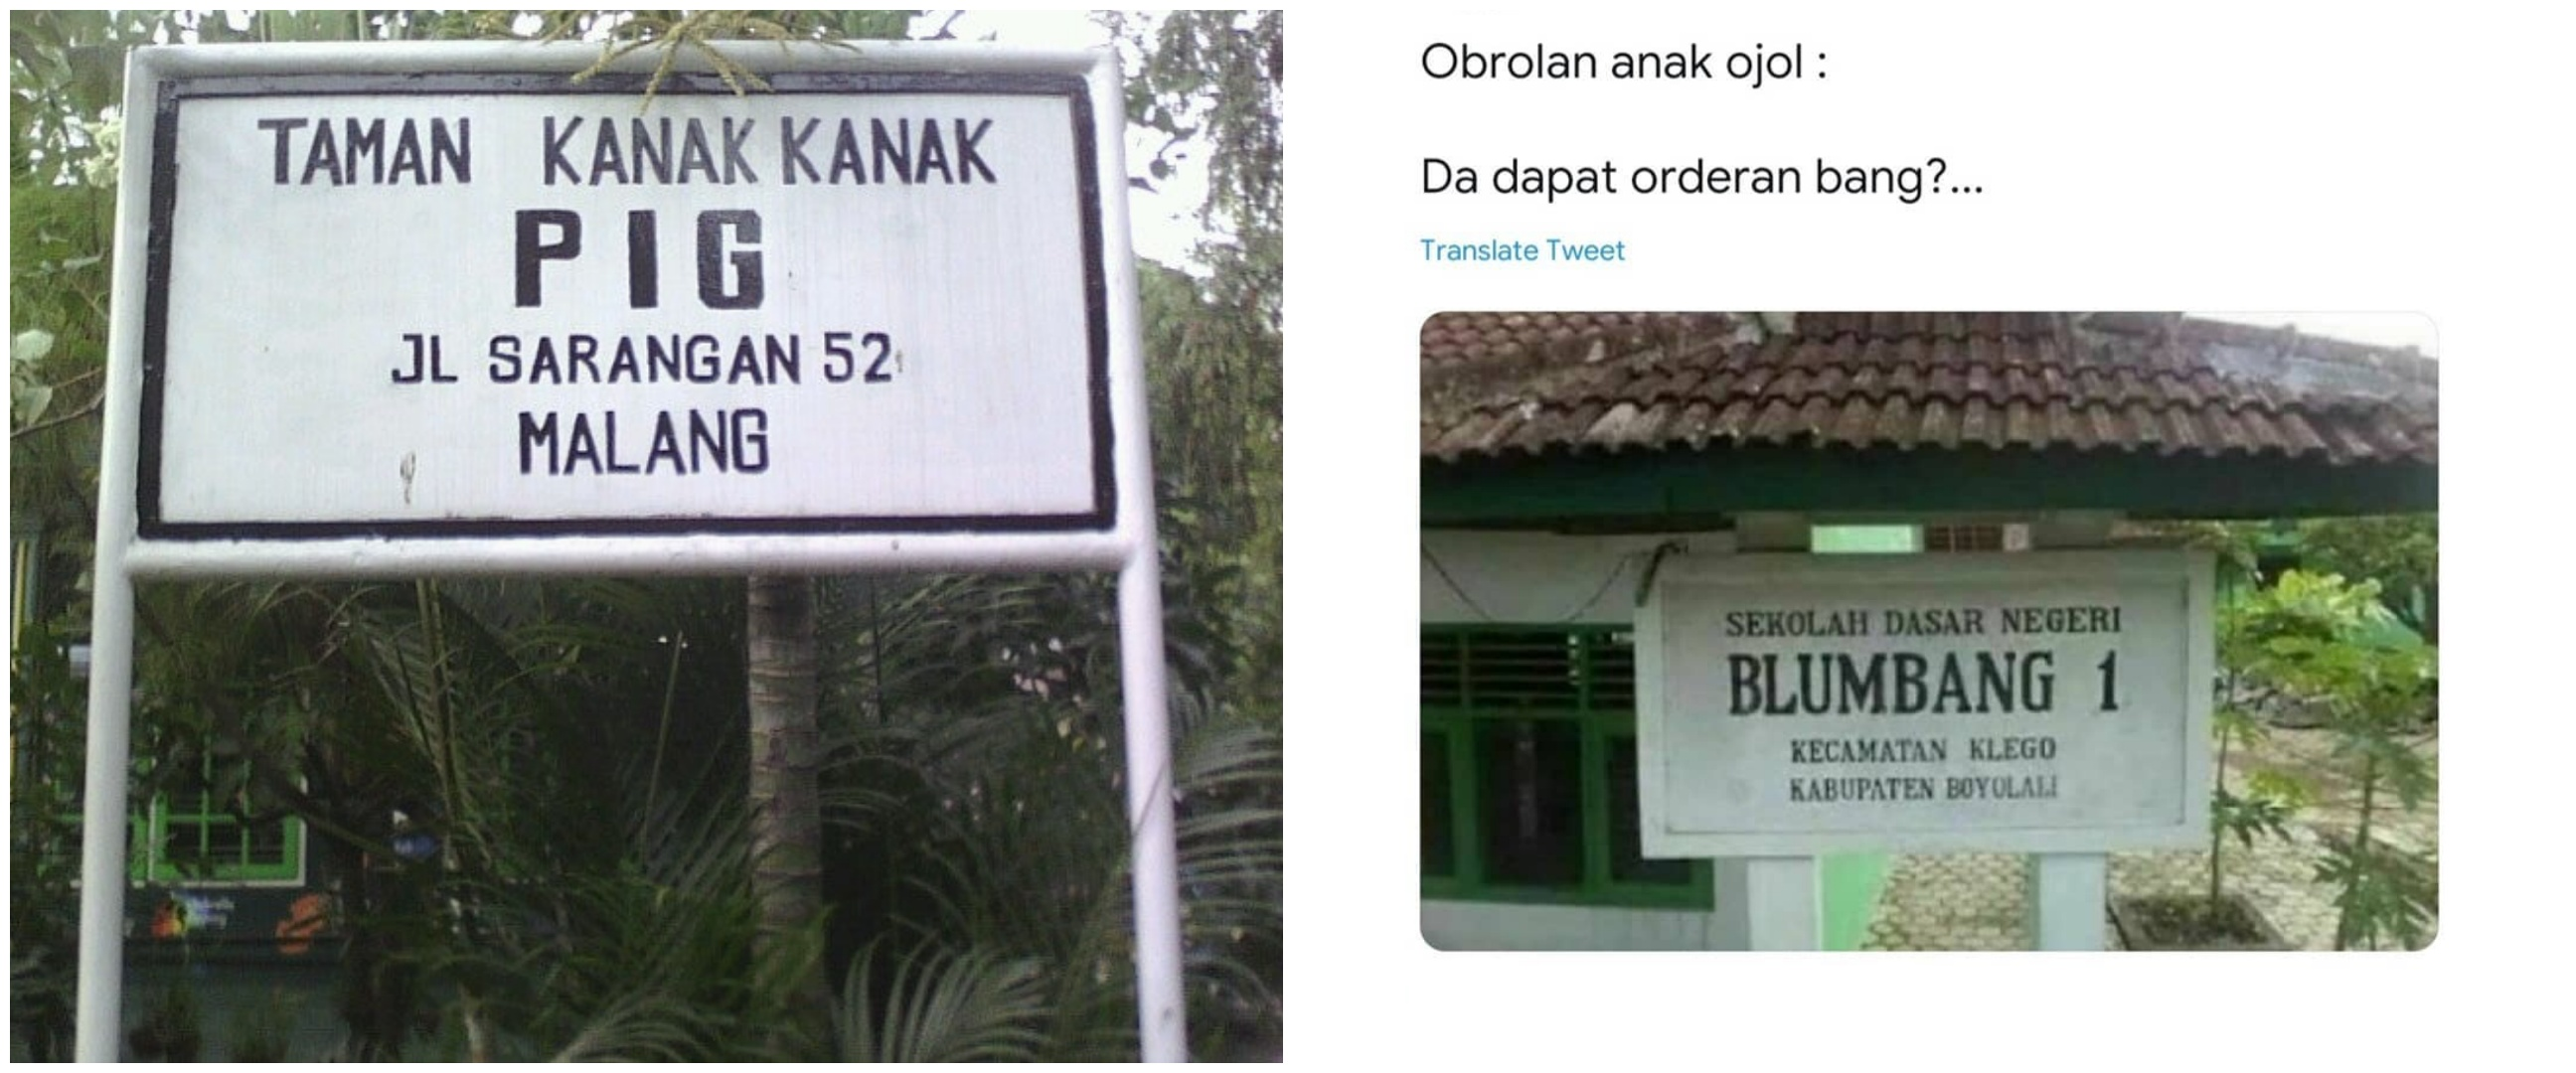 Cuma di Indonesia, 11 nama sekolah ini uniknya bikin nyengir